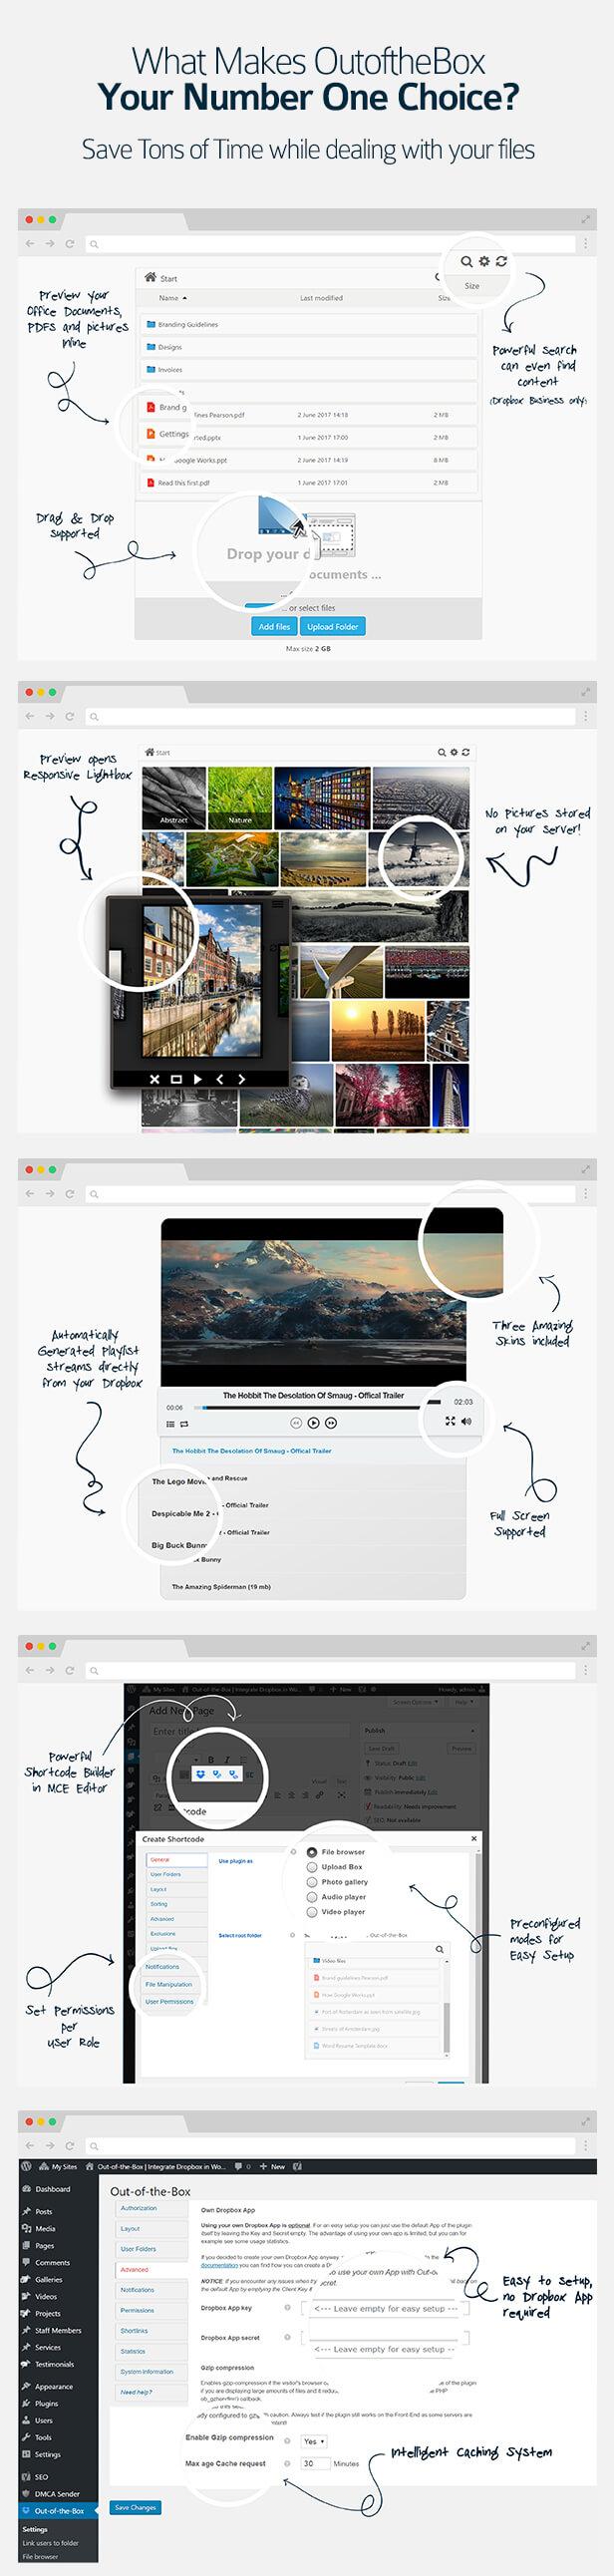 dropbox6 - Out-of-the-Box   Dropbox plugin for WordPress